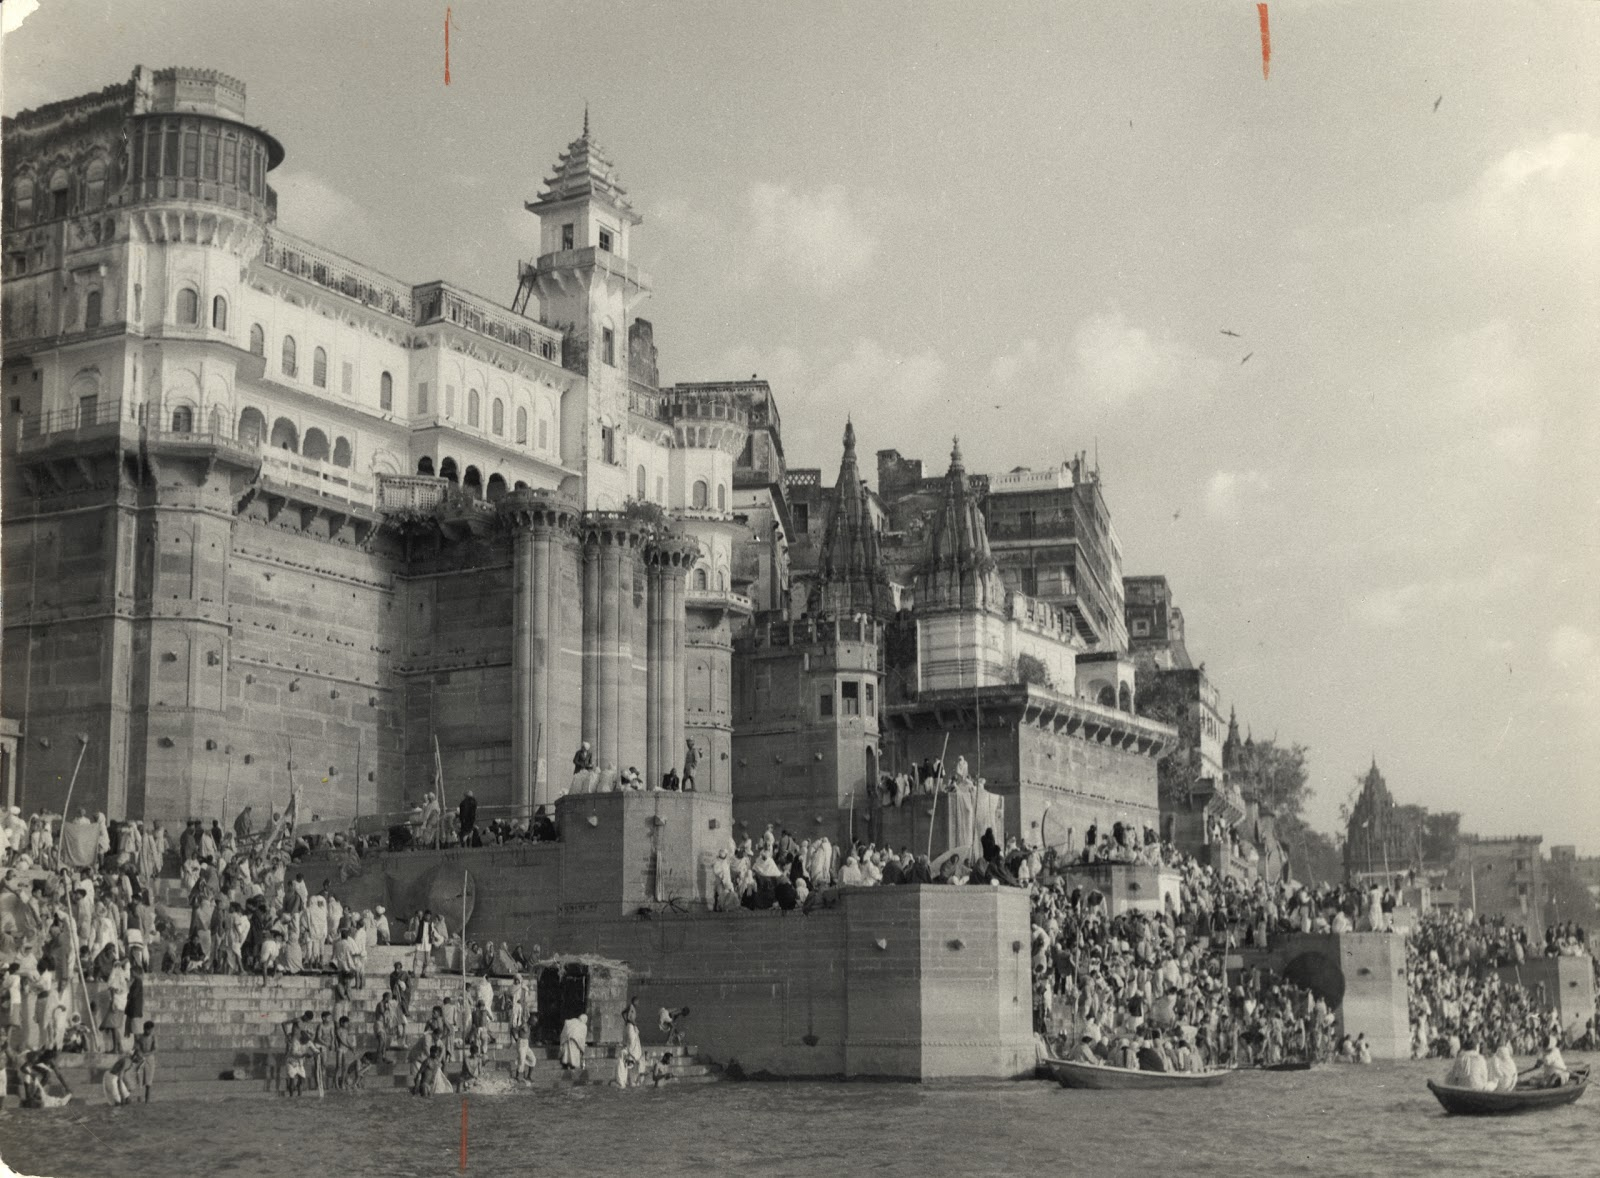 Hindu Pilgrims mass on the ghats on Ganges River at Banaras (Varanasi) under walls of palace during a festival - c1940-50's